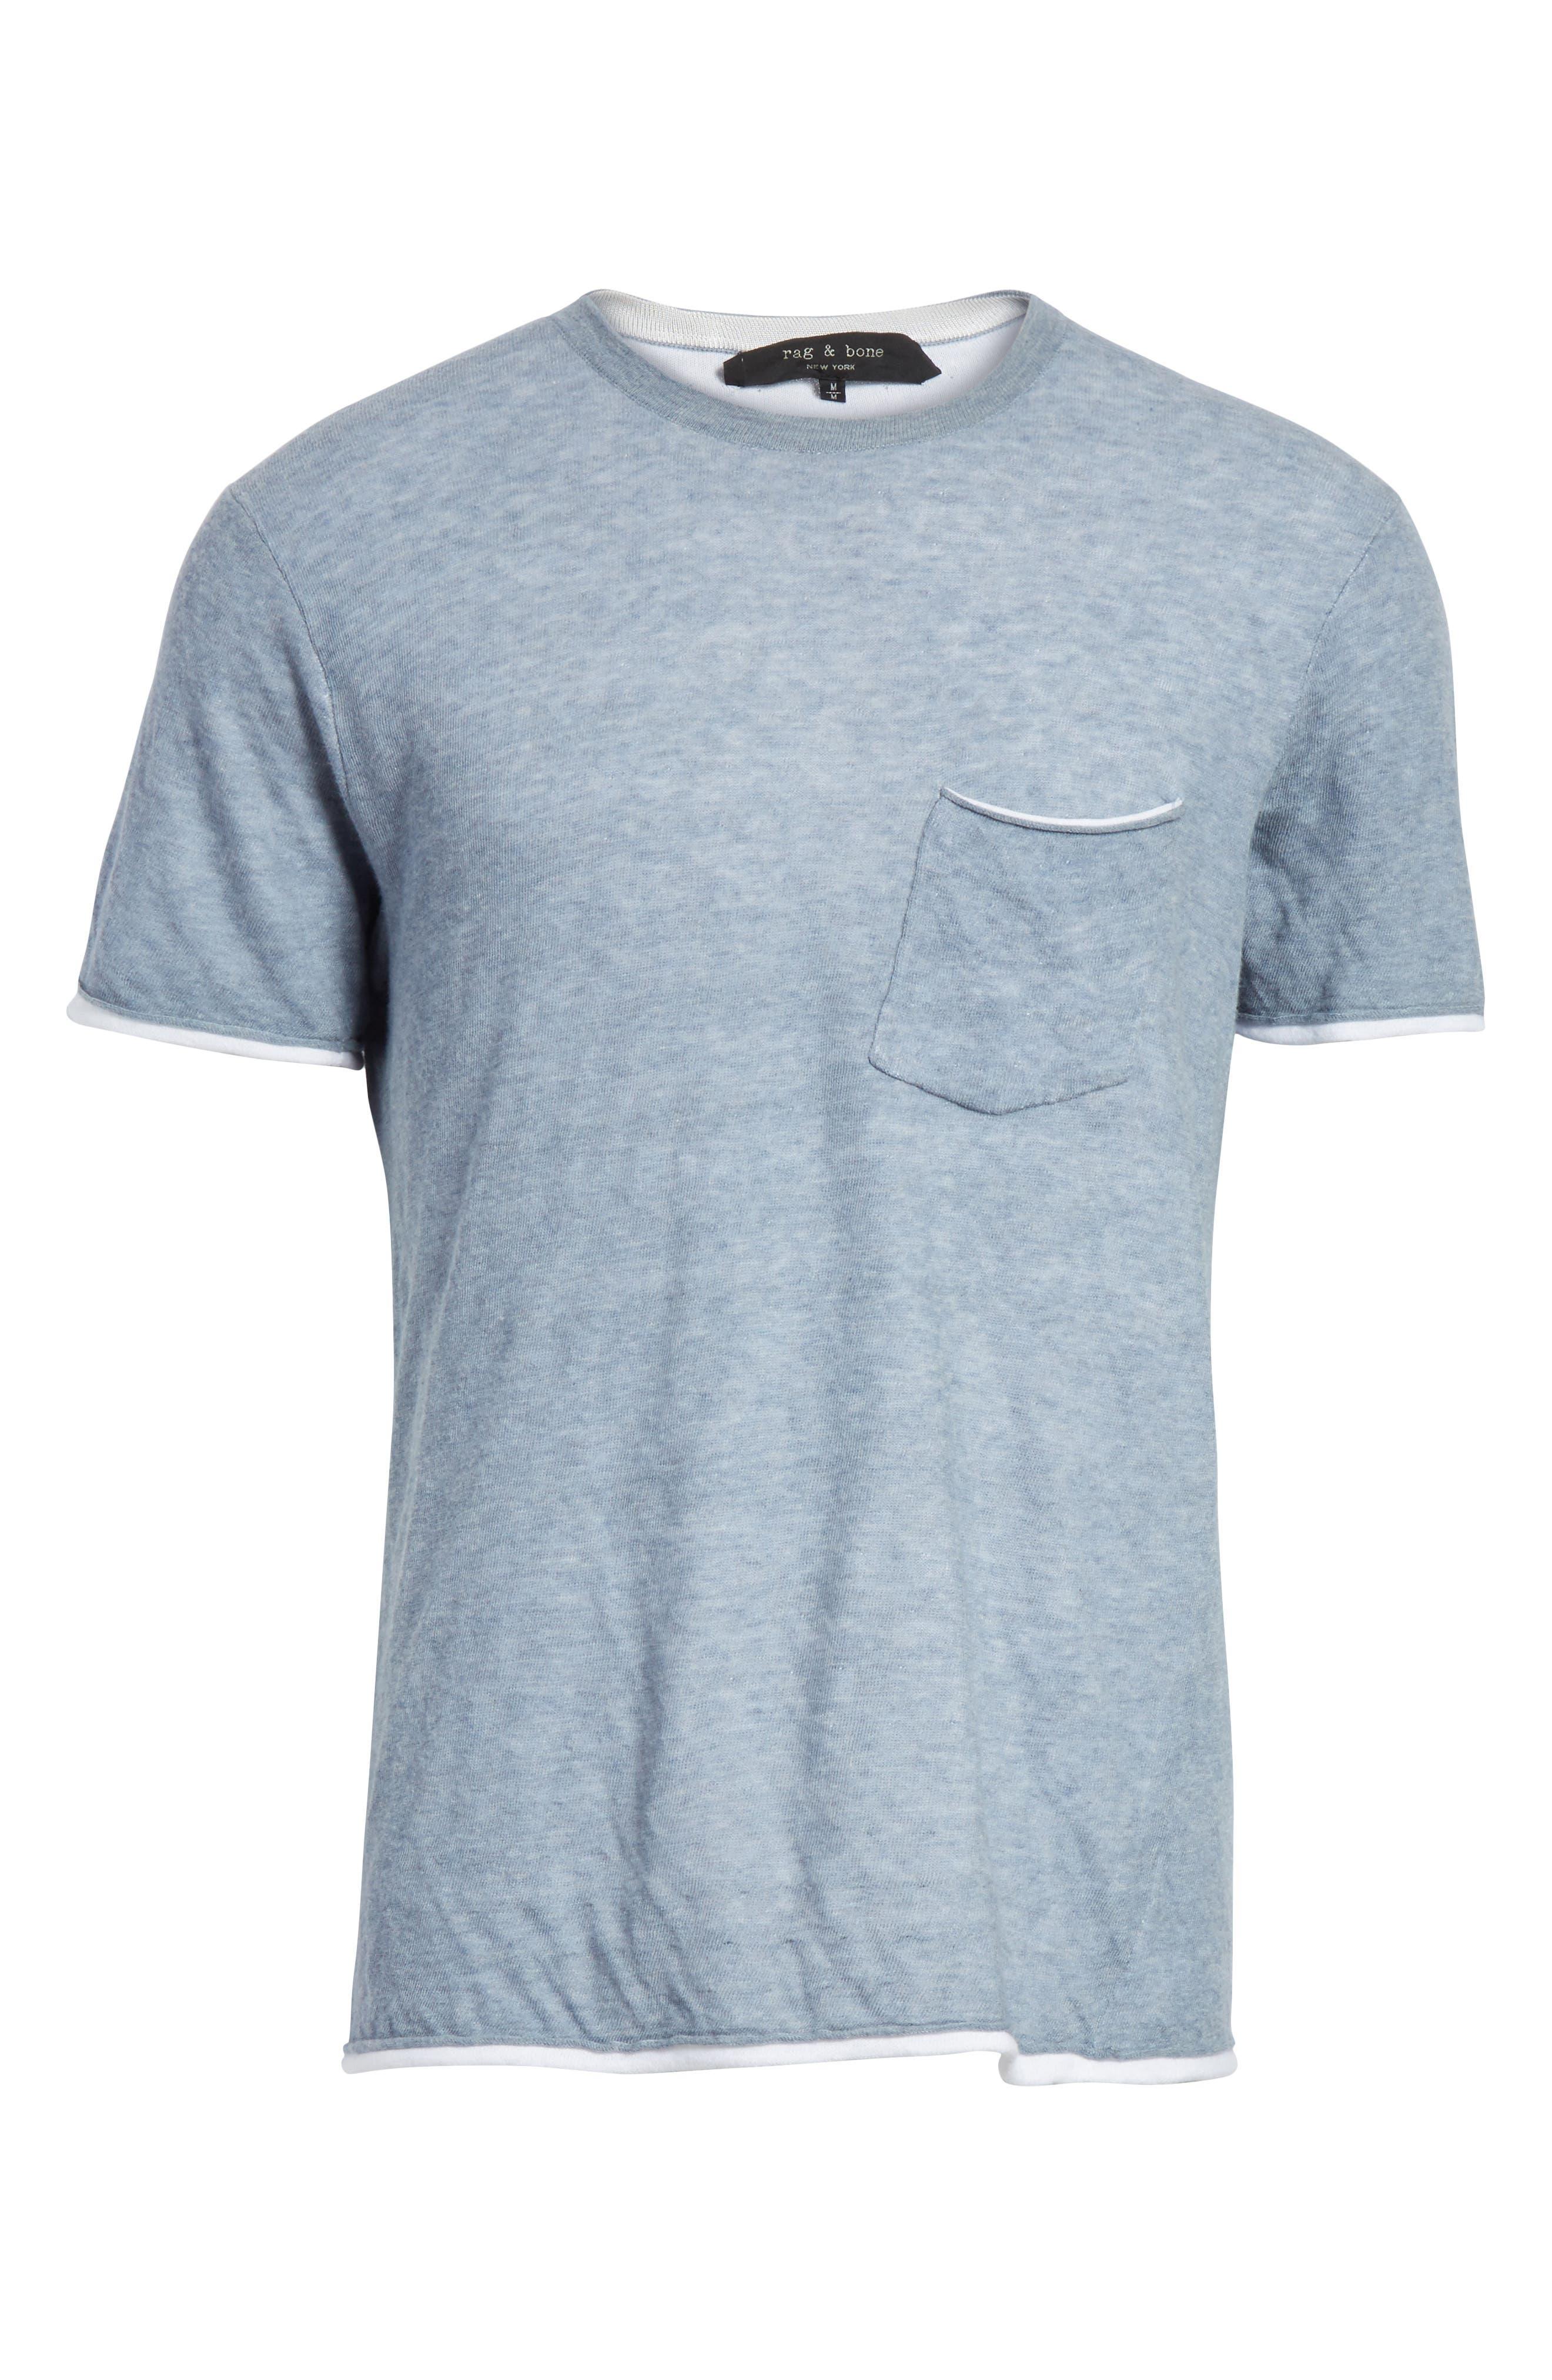 Tripp Pocket T-Shirt,                             Alternate thumbnail 6, color,                             455